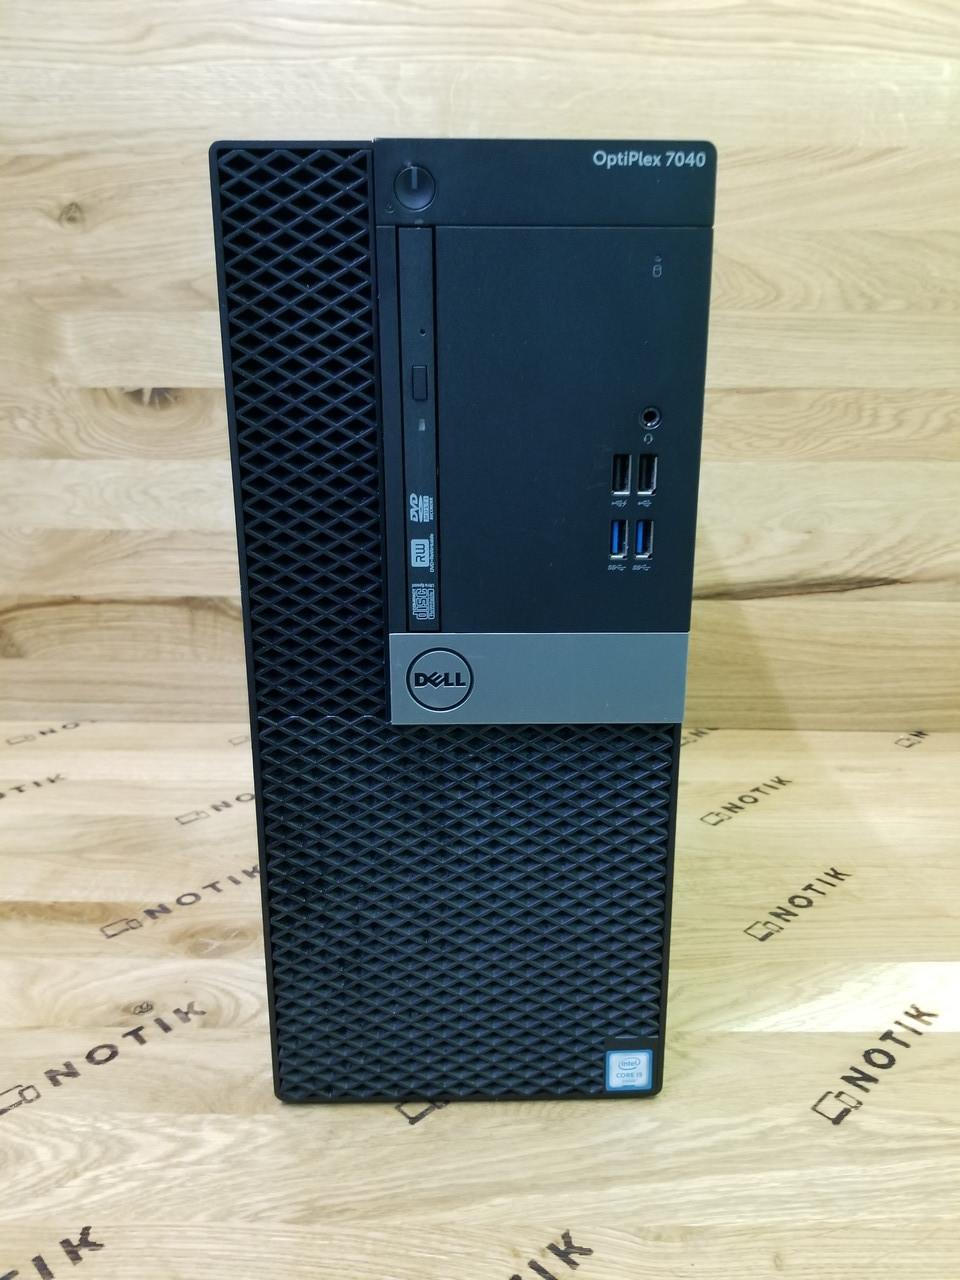 ПК Комп'ютер Dell OptiPlex 7040 Tower - i5-6500/4GB/500GB